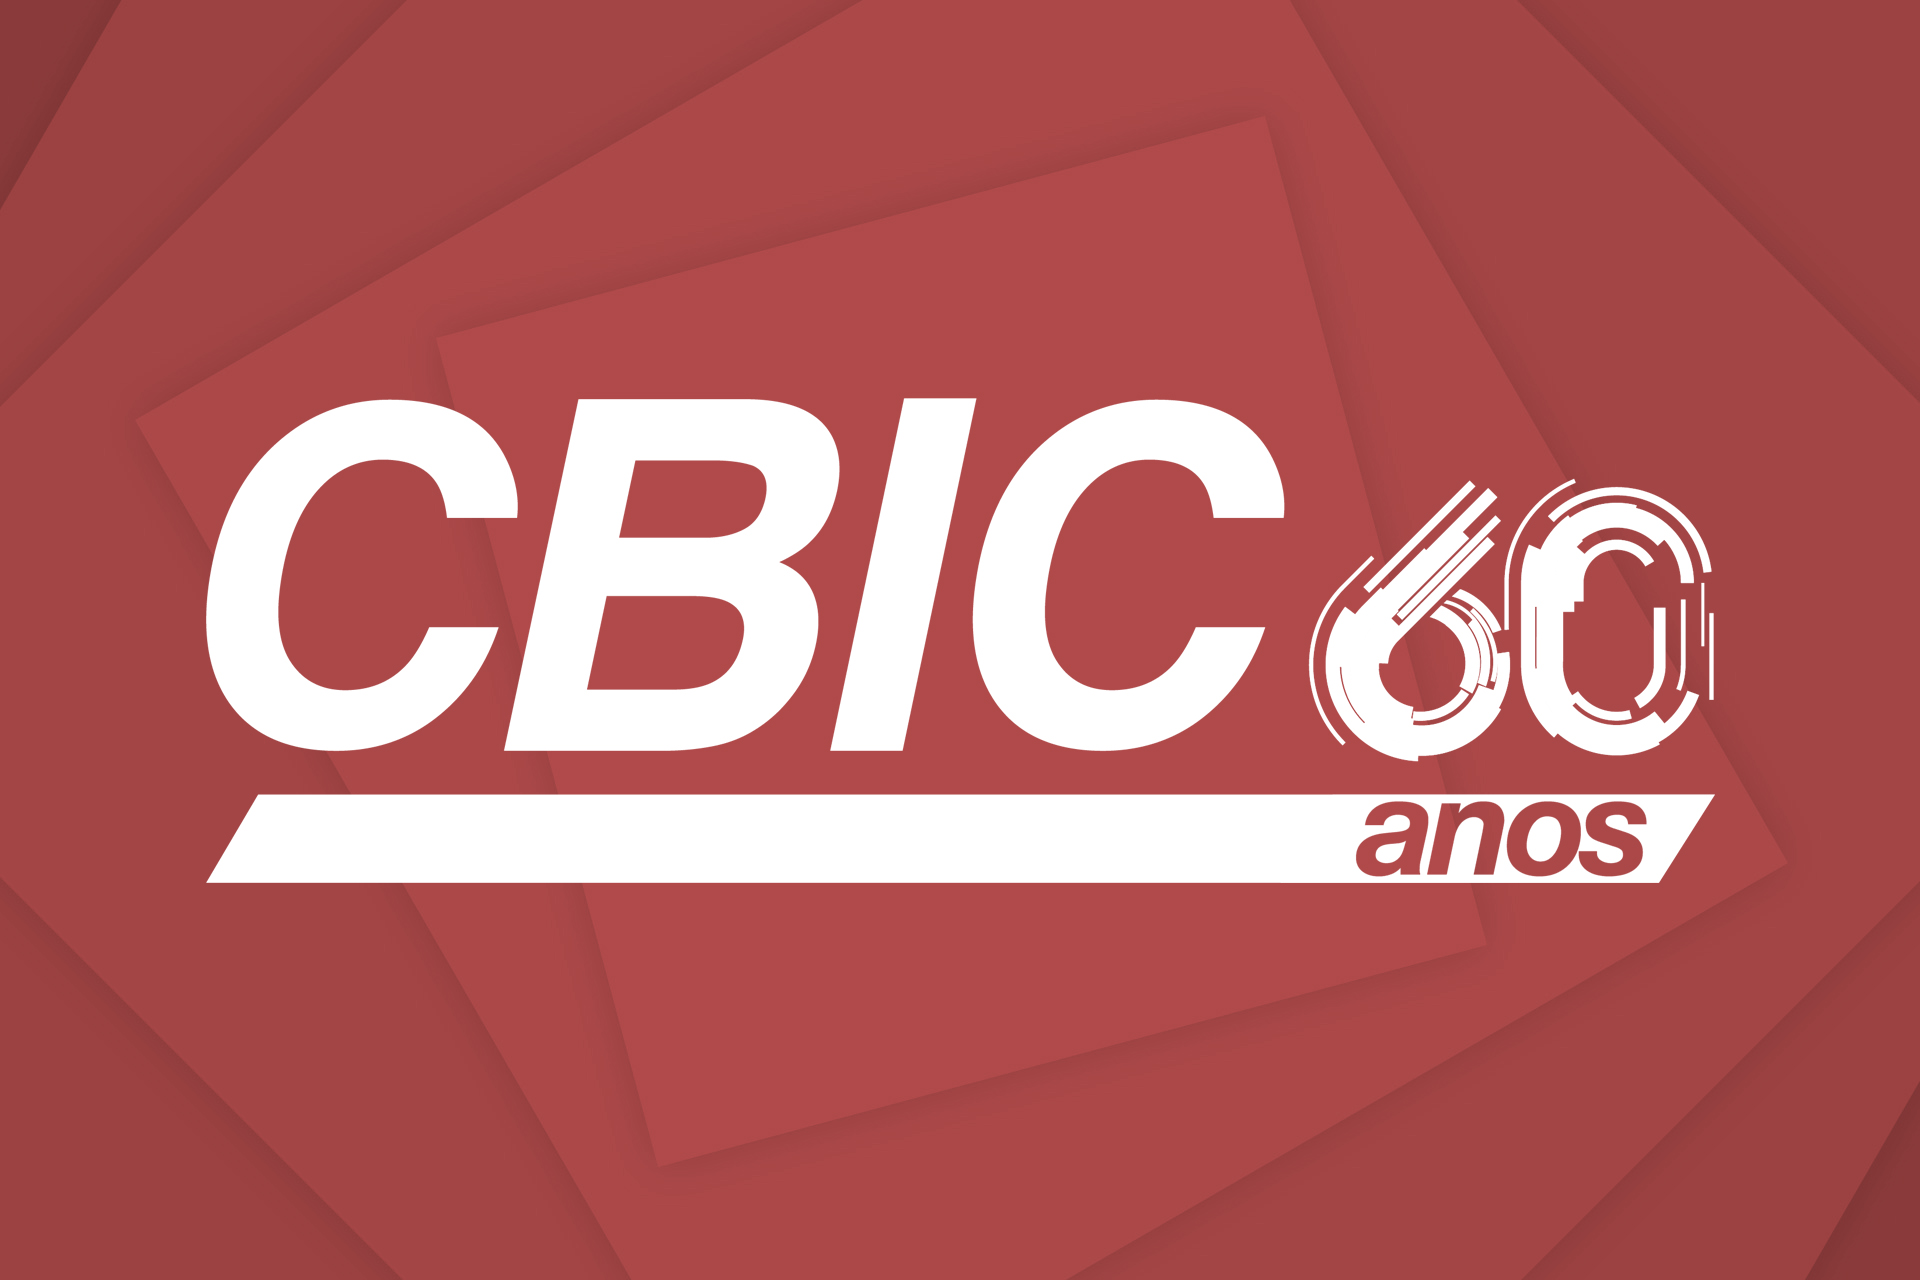 Vinhetas – Premio CBIC de Responsabilidade Social 2017